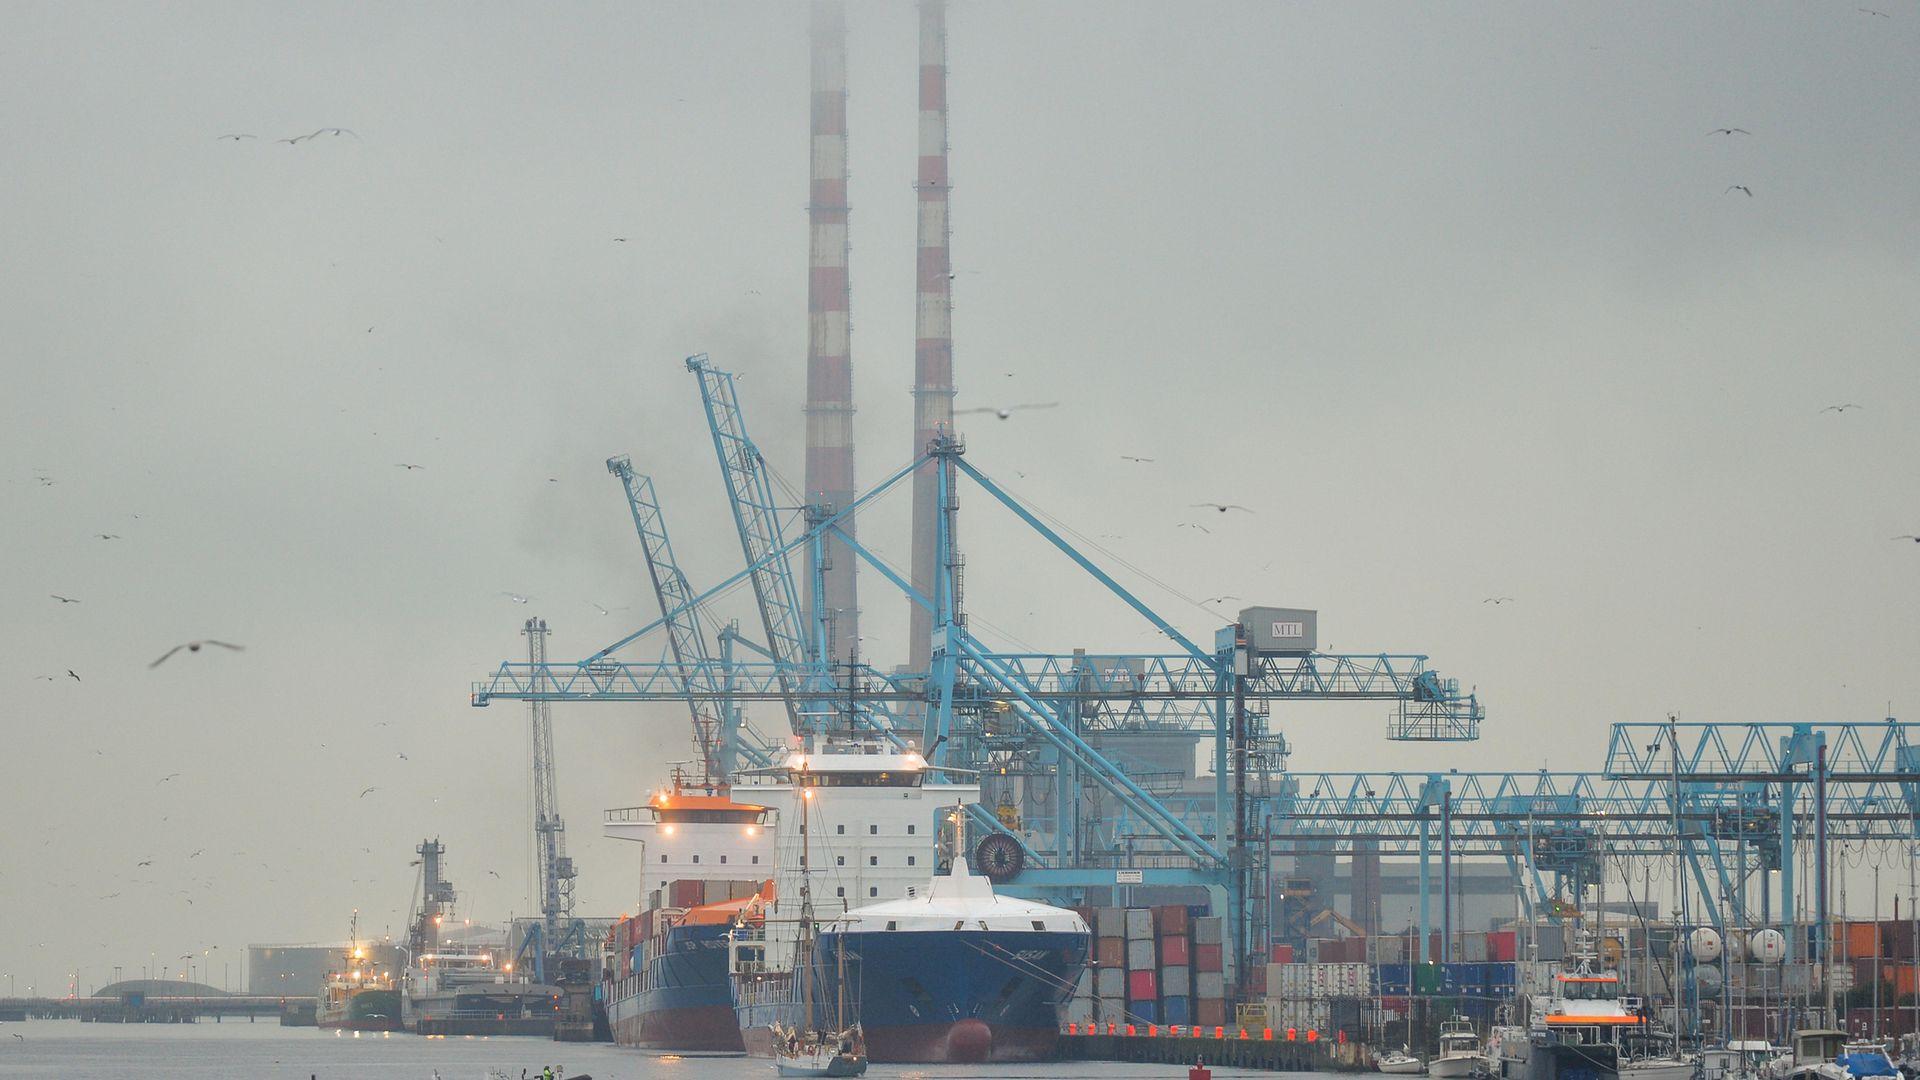 A container terminal at Dublin port. Ireland has seen trade with Europe increase. - Credit: Artur Widak/NurPhoto